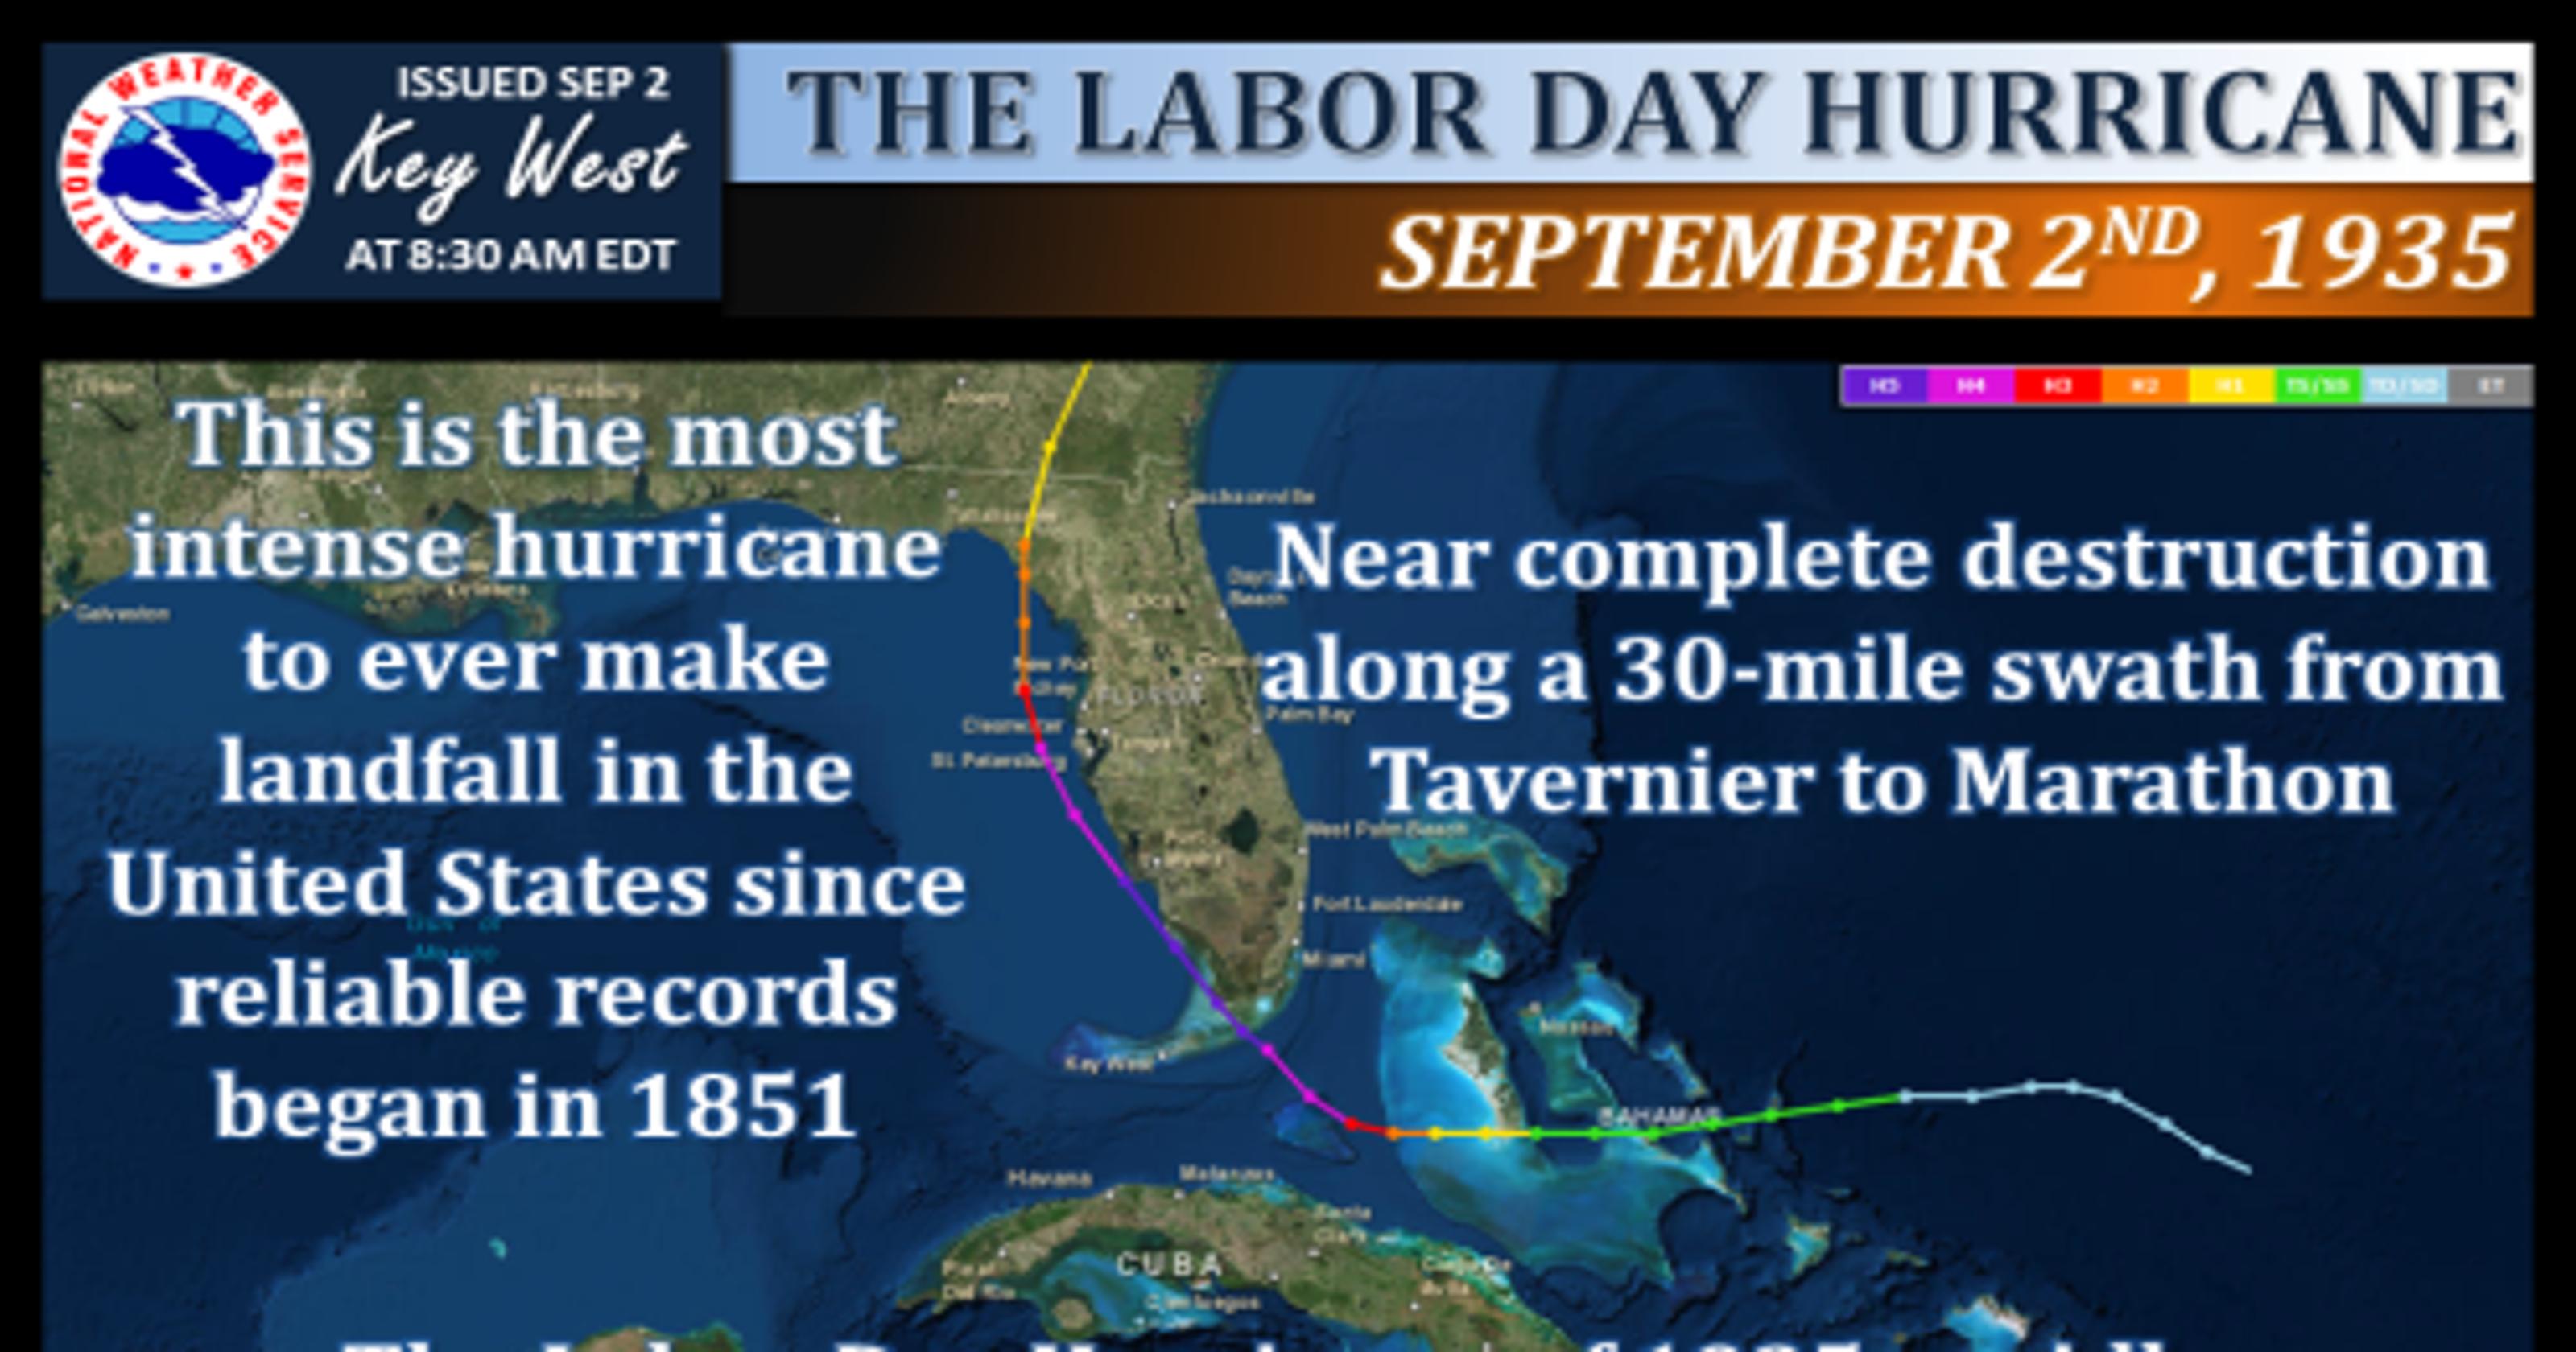 Labor Day Hurricane Clobbered Keys 79 Years Ago